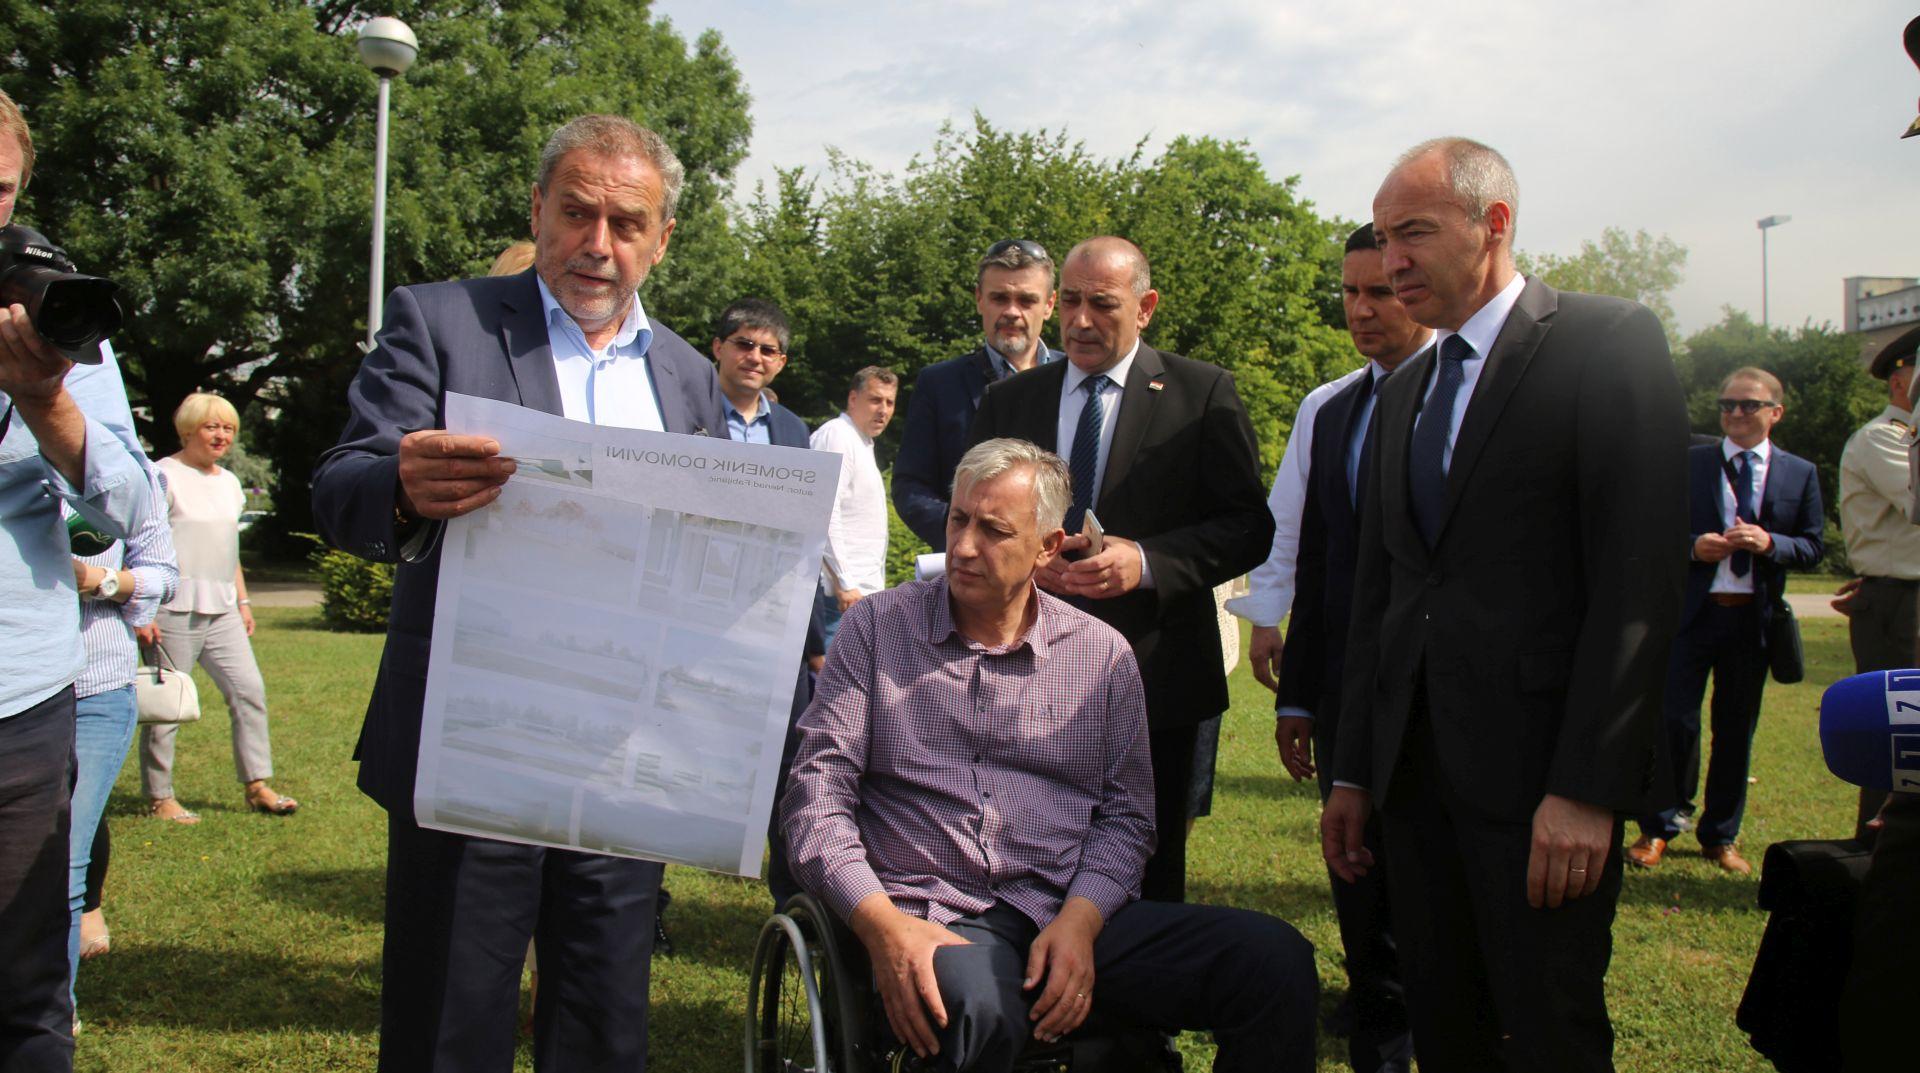 Bandić, Krstičević i Medved najavili izgradnju Spomenika domovini, Vojnog muzeja i vojnog groblja